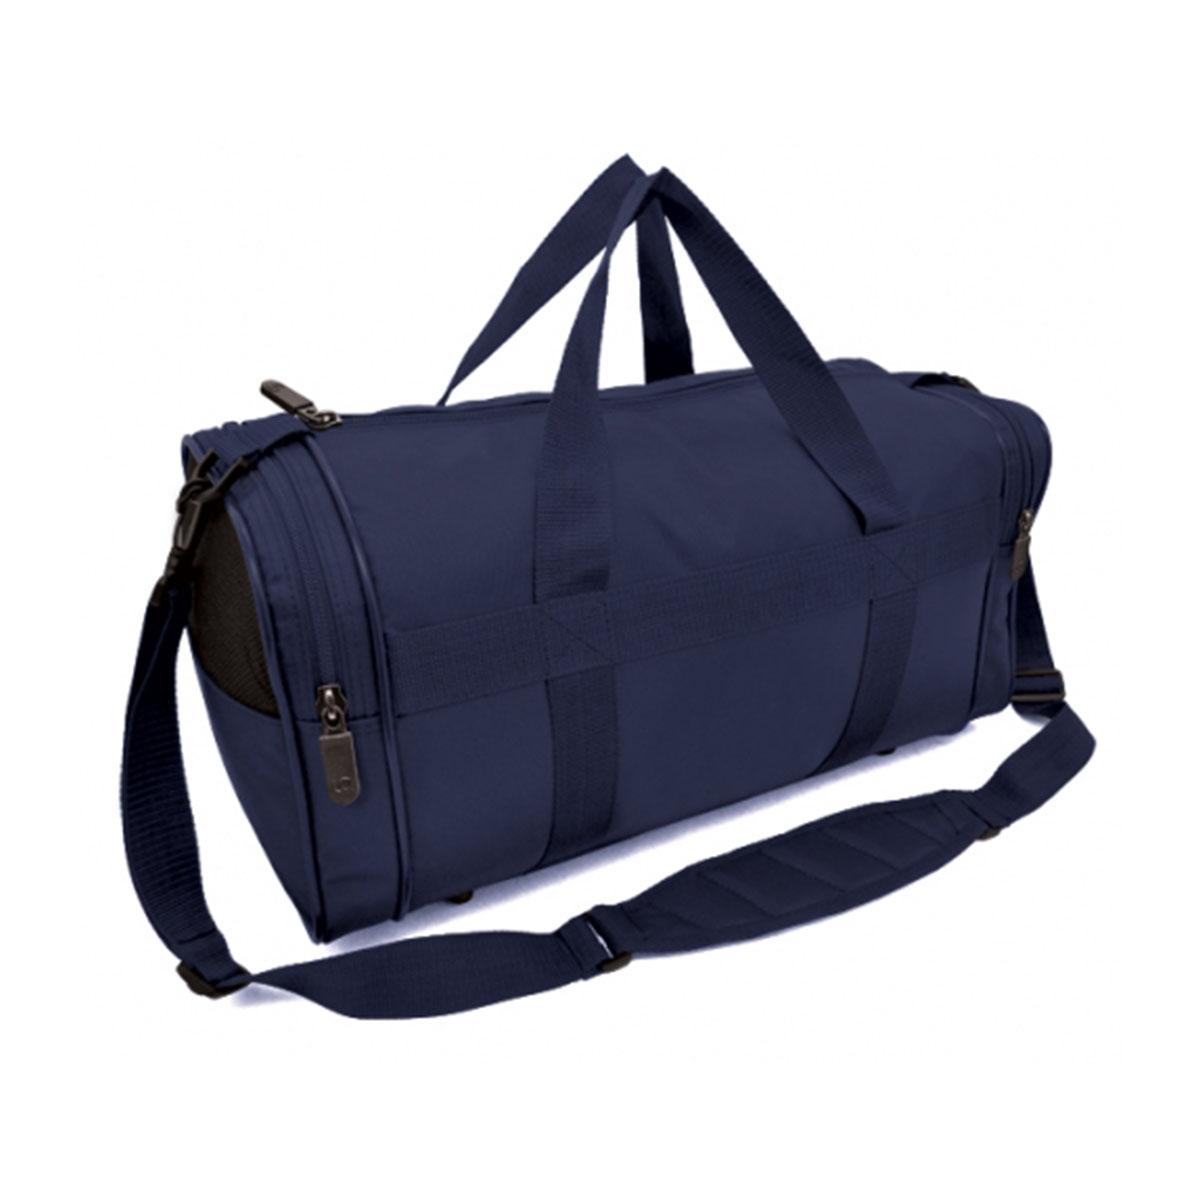 Pronto Sports Bag-Navy